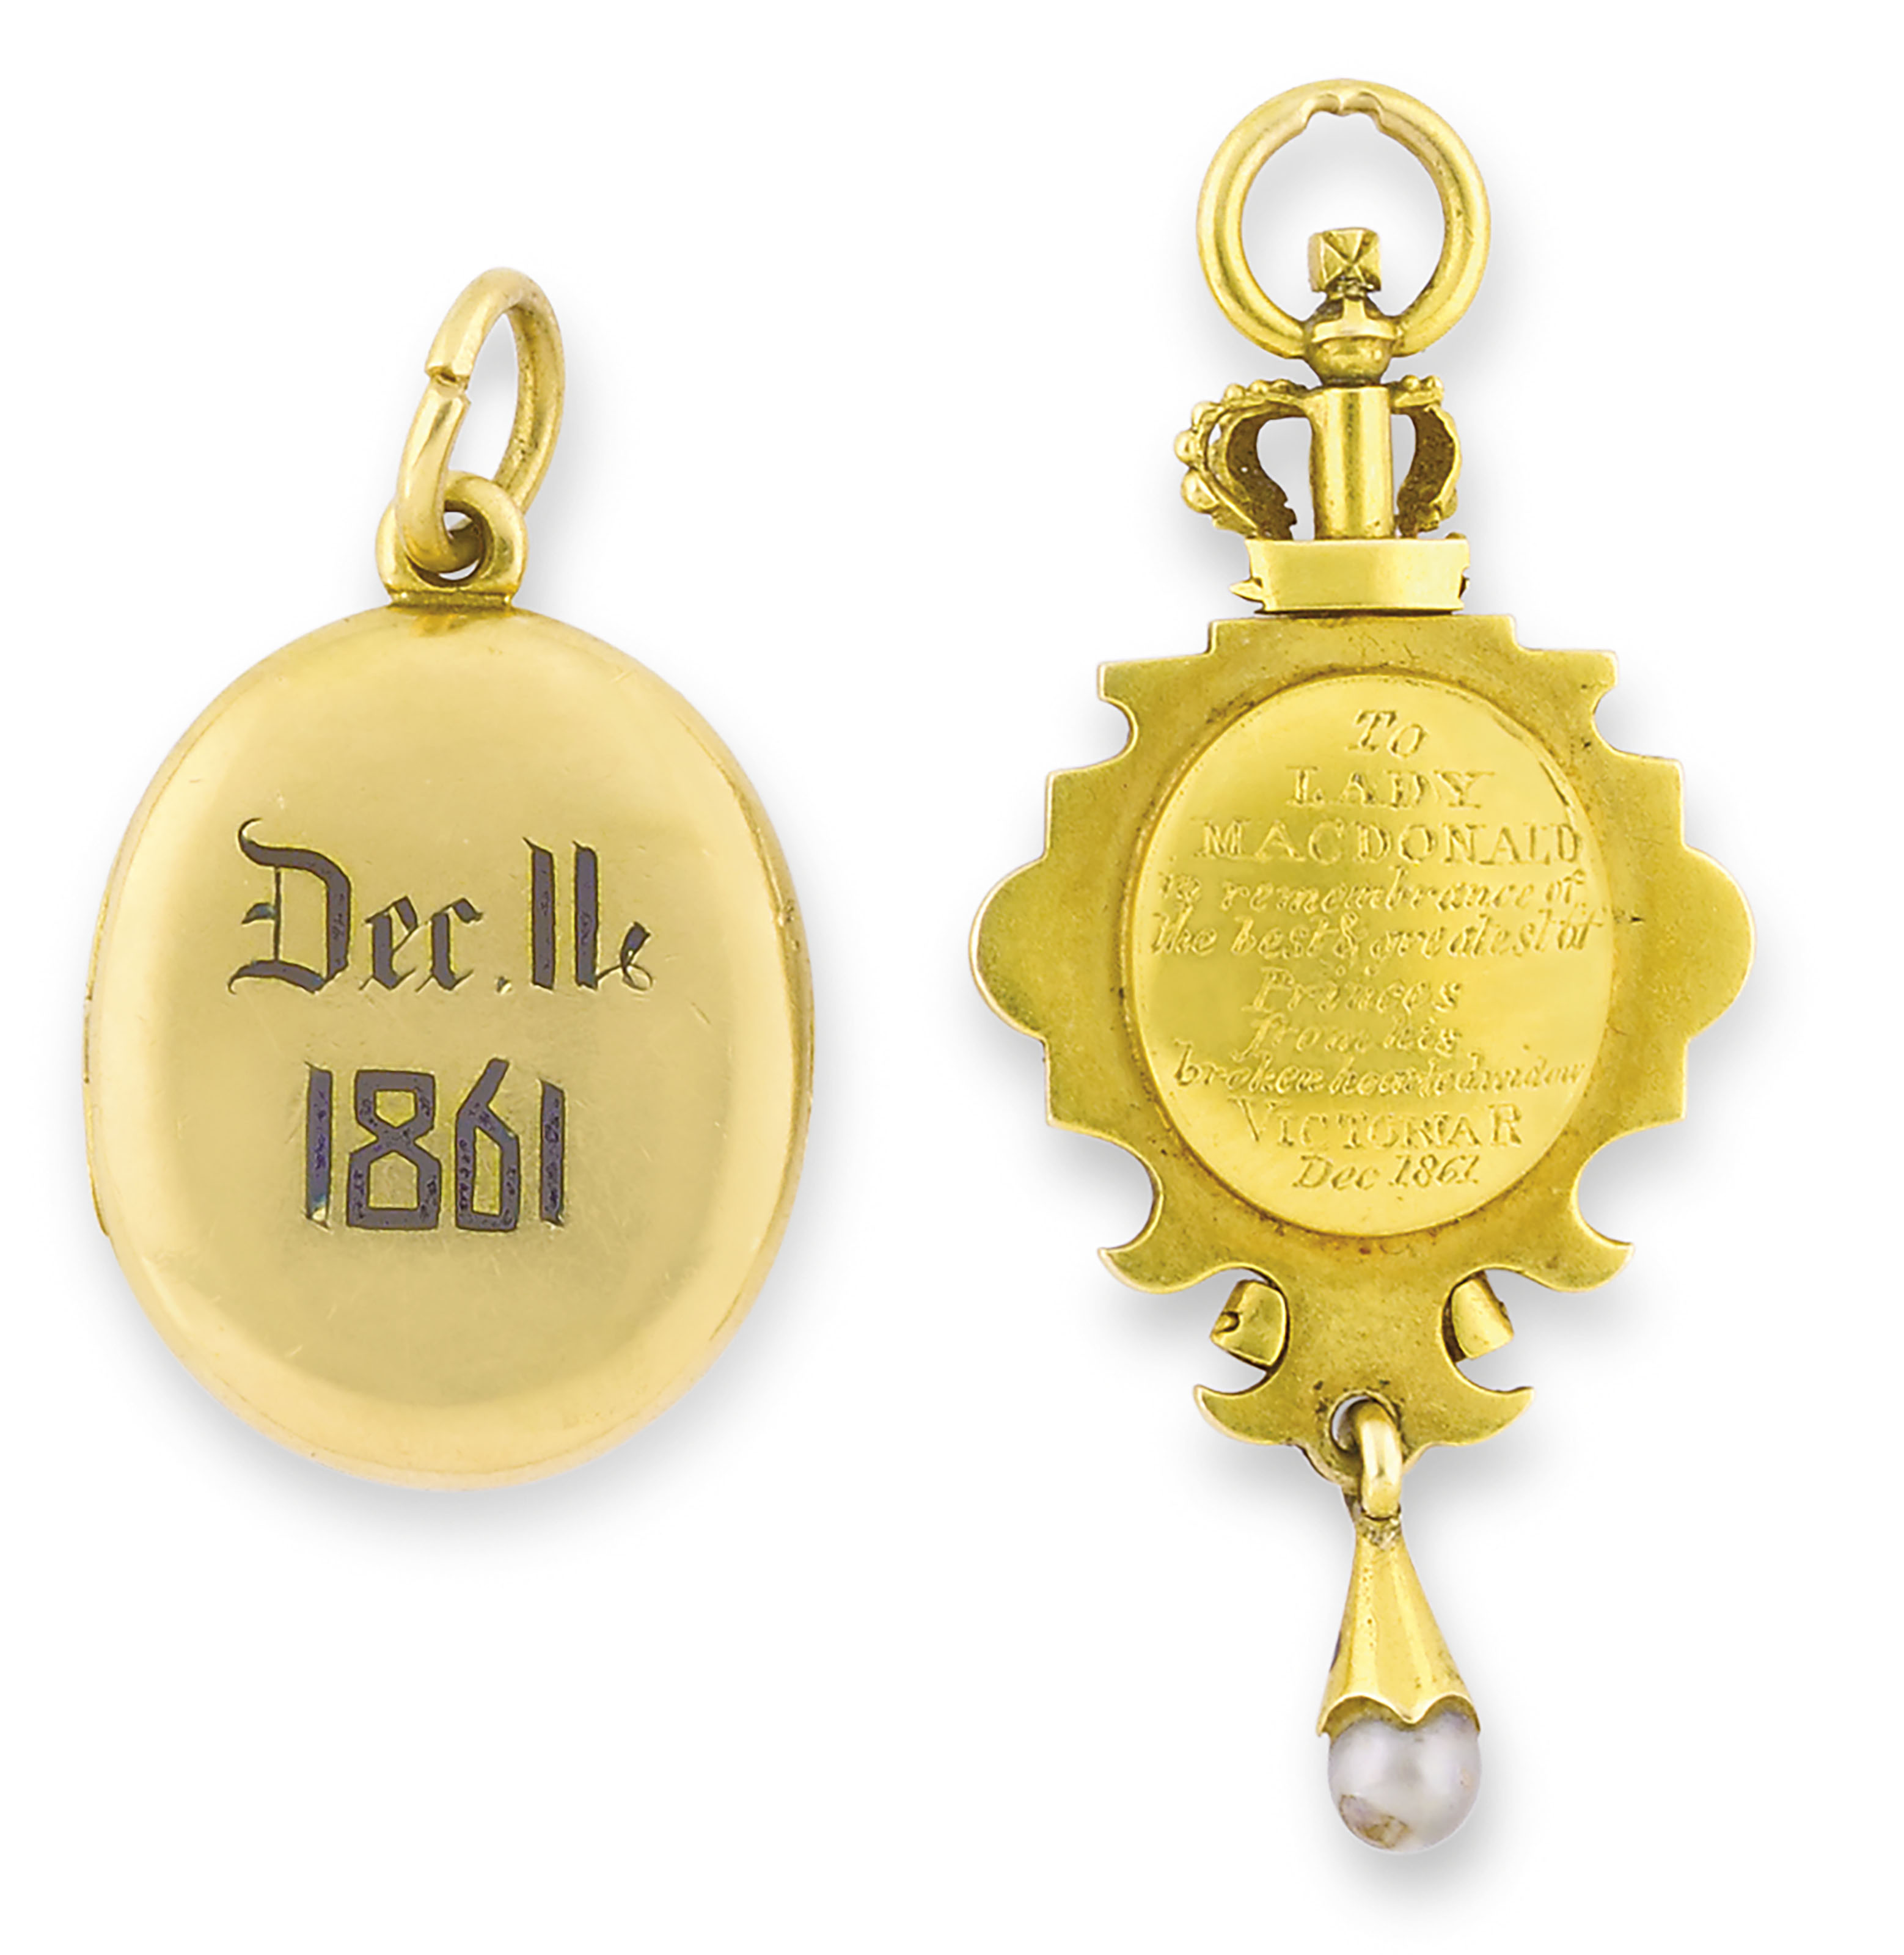 PRINCE ALBERT (1819-1861) A VI